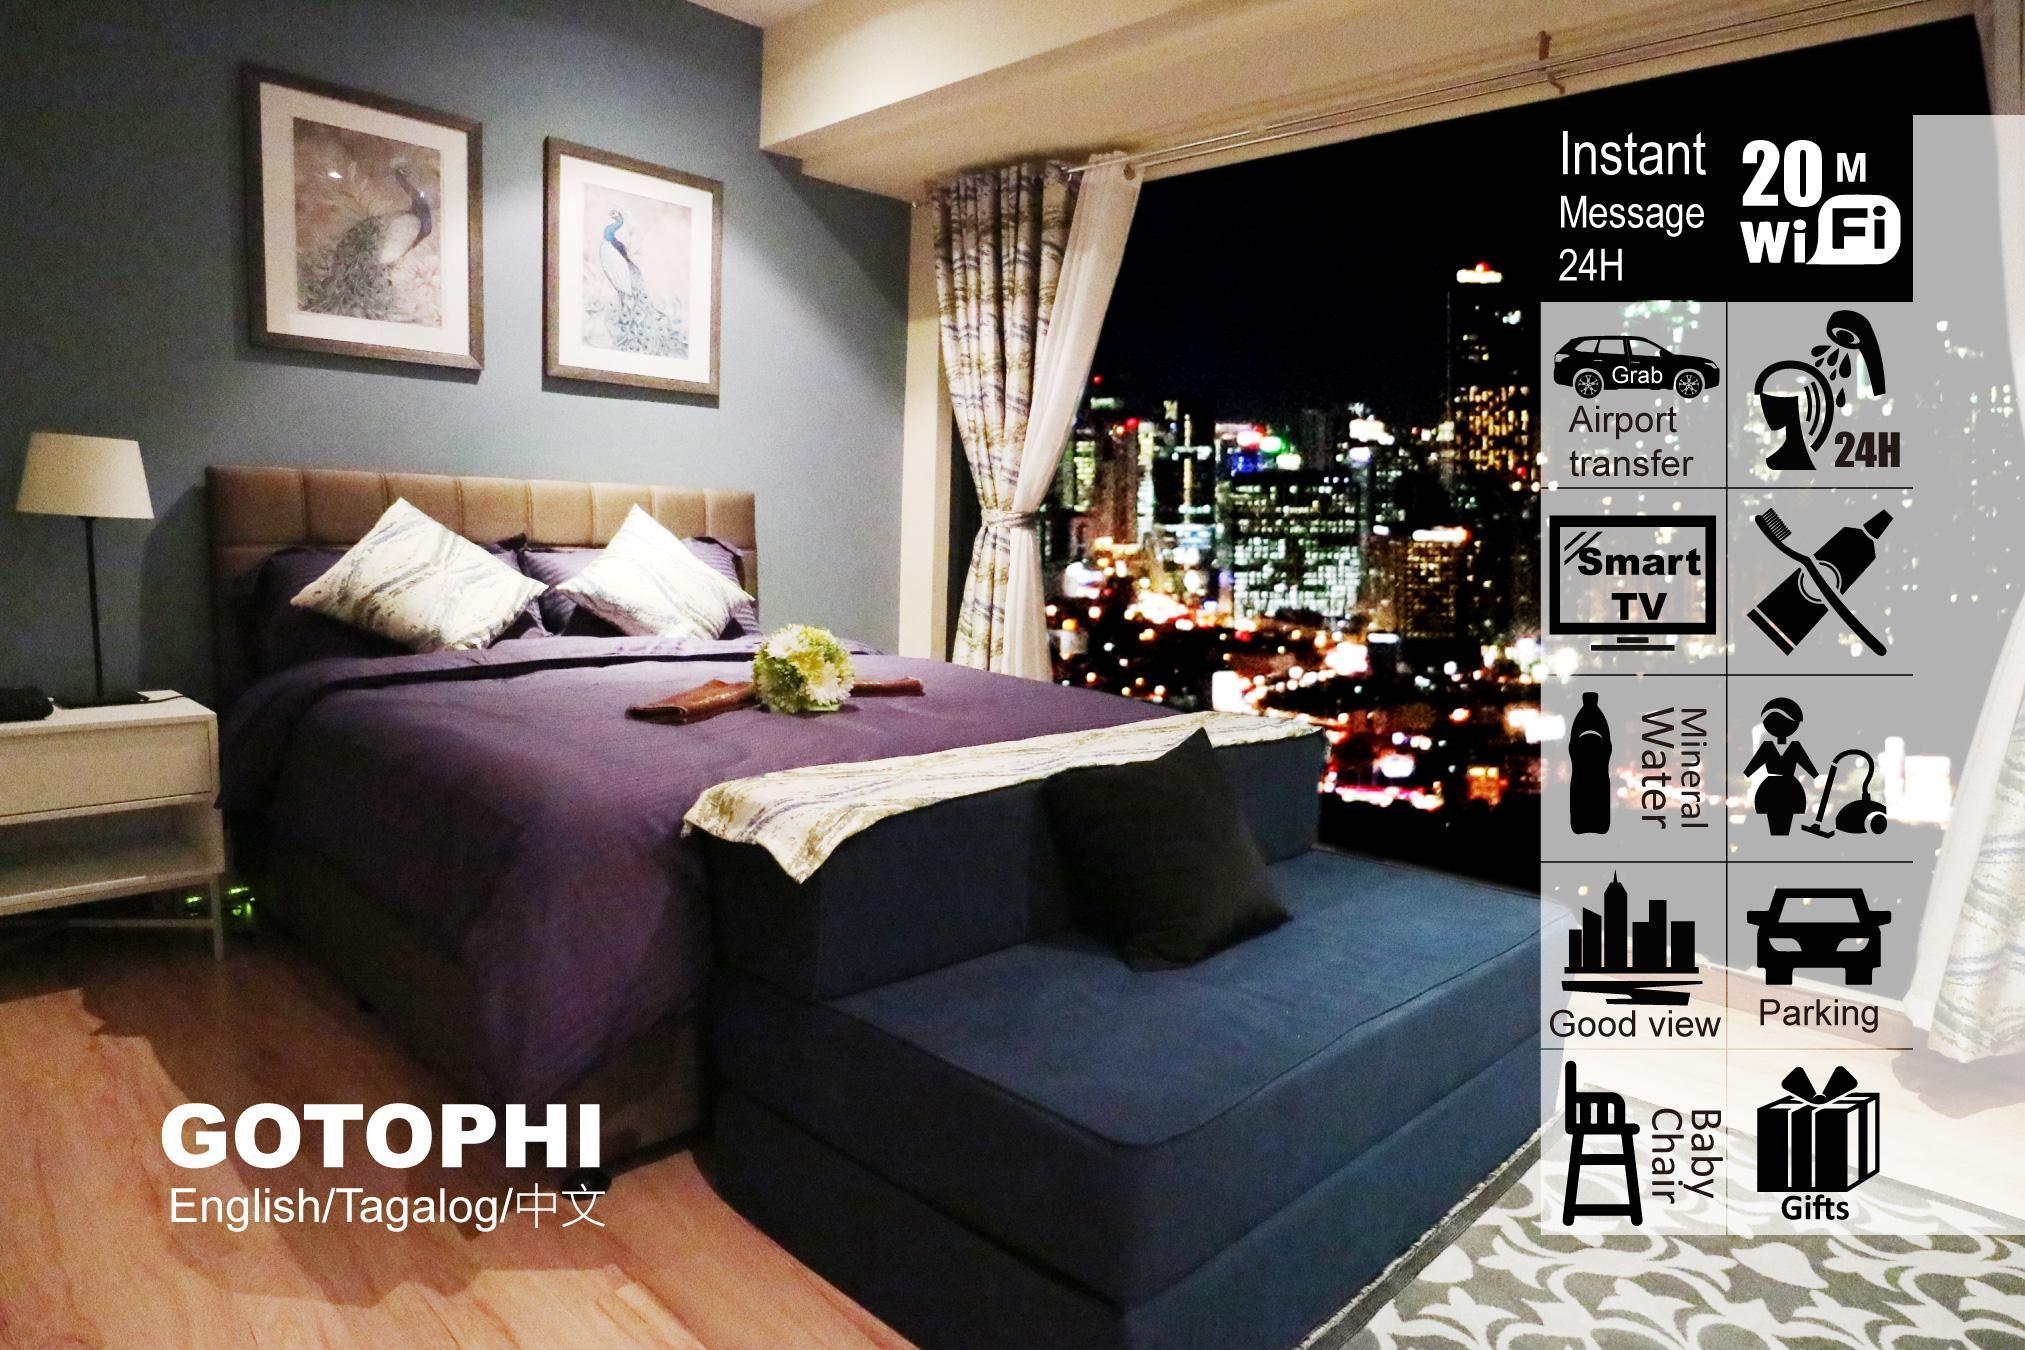 Gotophi Luxurious Hotel Knightsbridge Makati